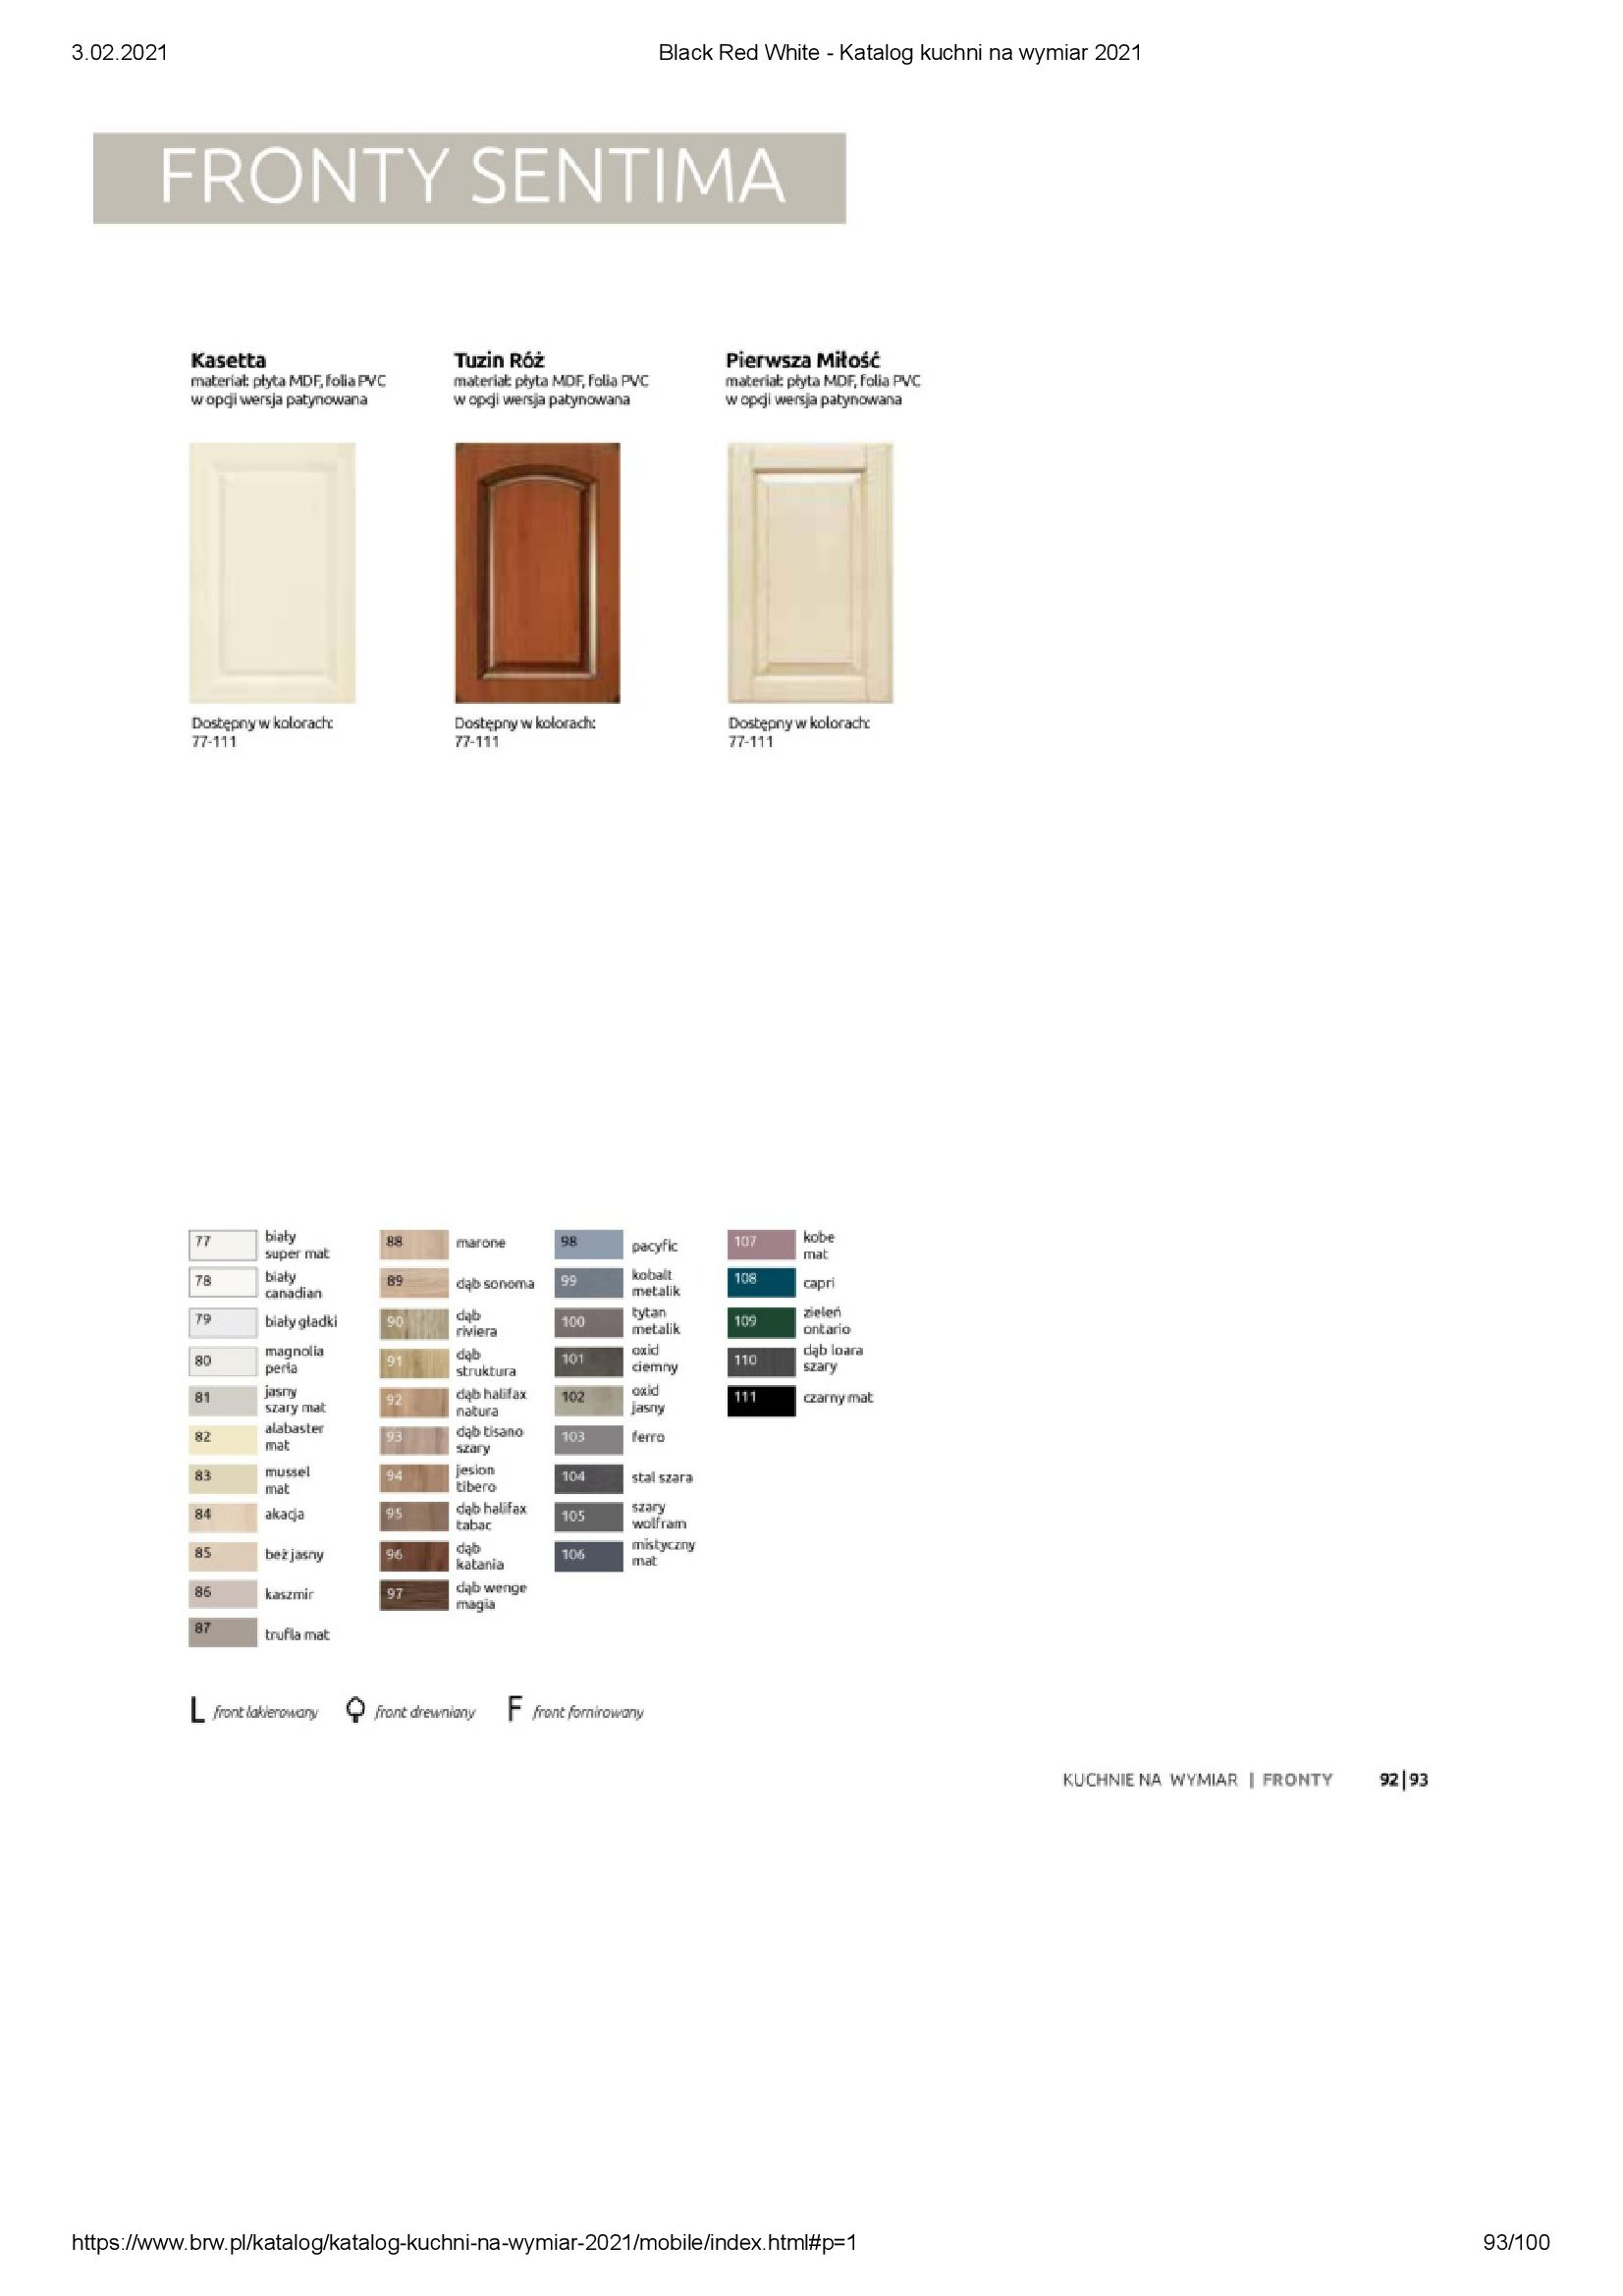 Gazetka Black Red White: Katalog - Kuchnie na wymiar Senso Kitchens 2021 2021-01-01 page-93